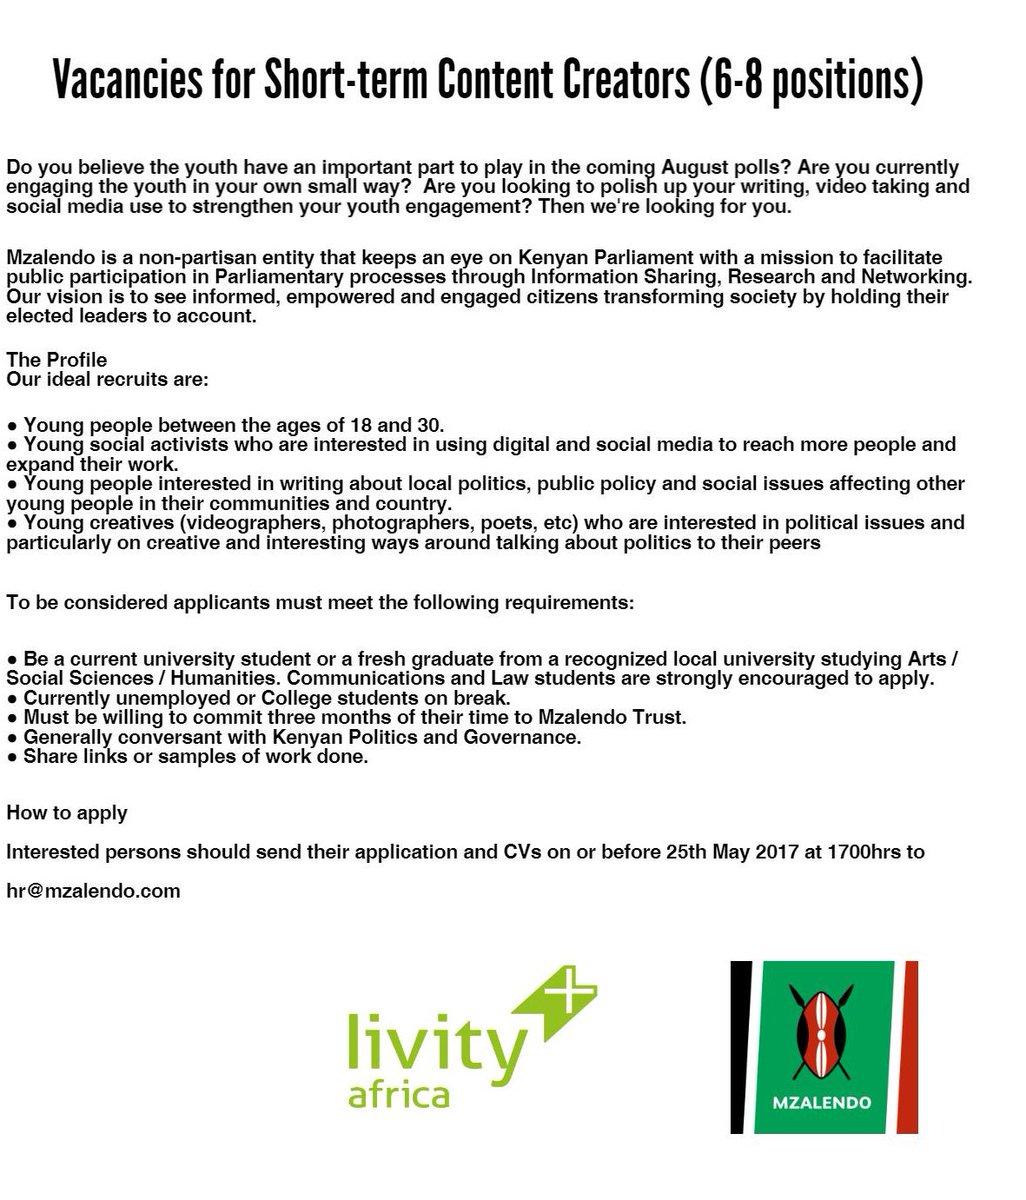 We're hiring: vacancies for short-term content creators. See poster for details https://t.co/0mZXOcb6Gu